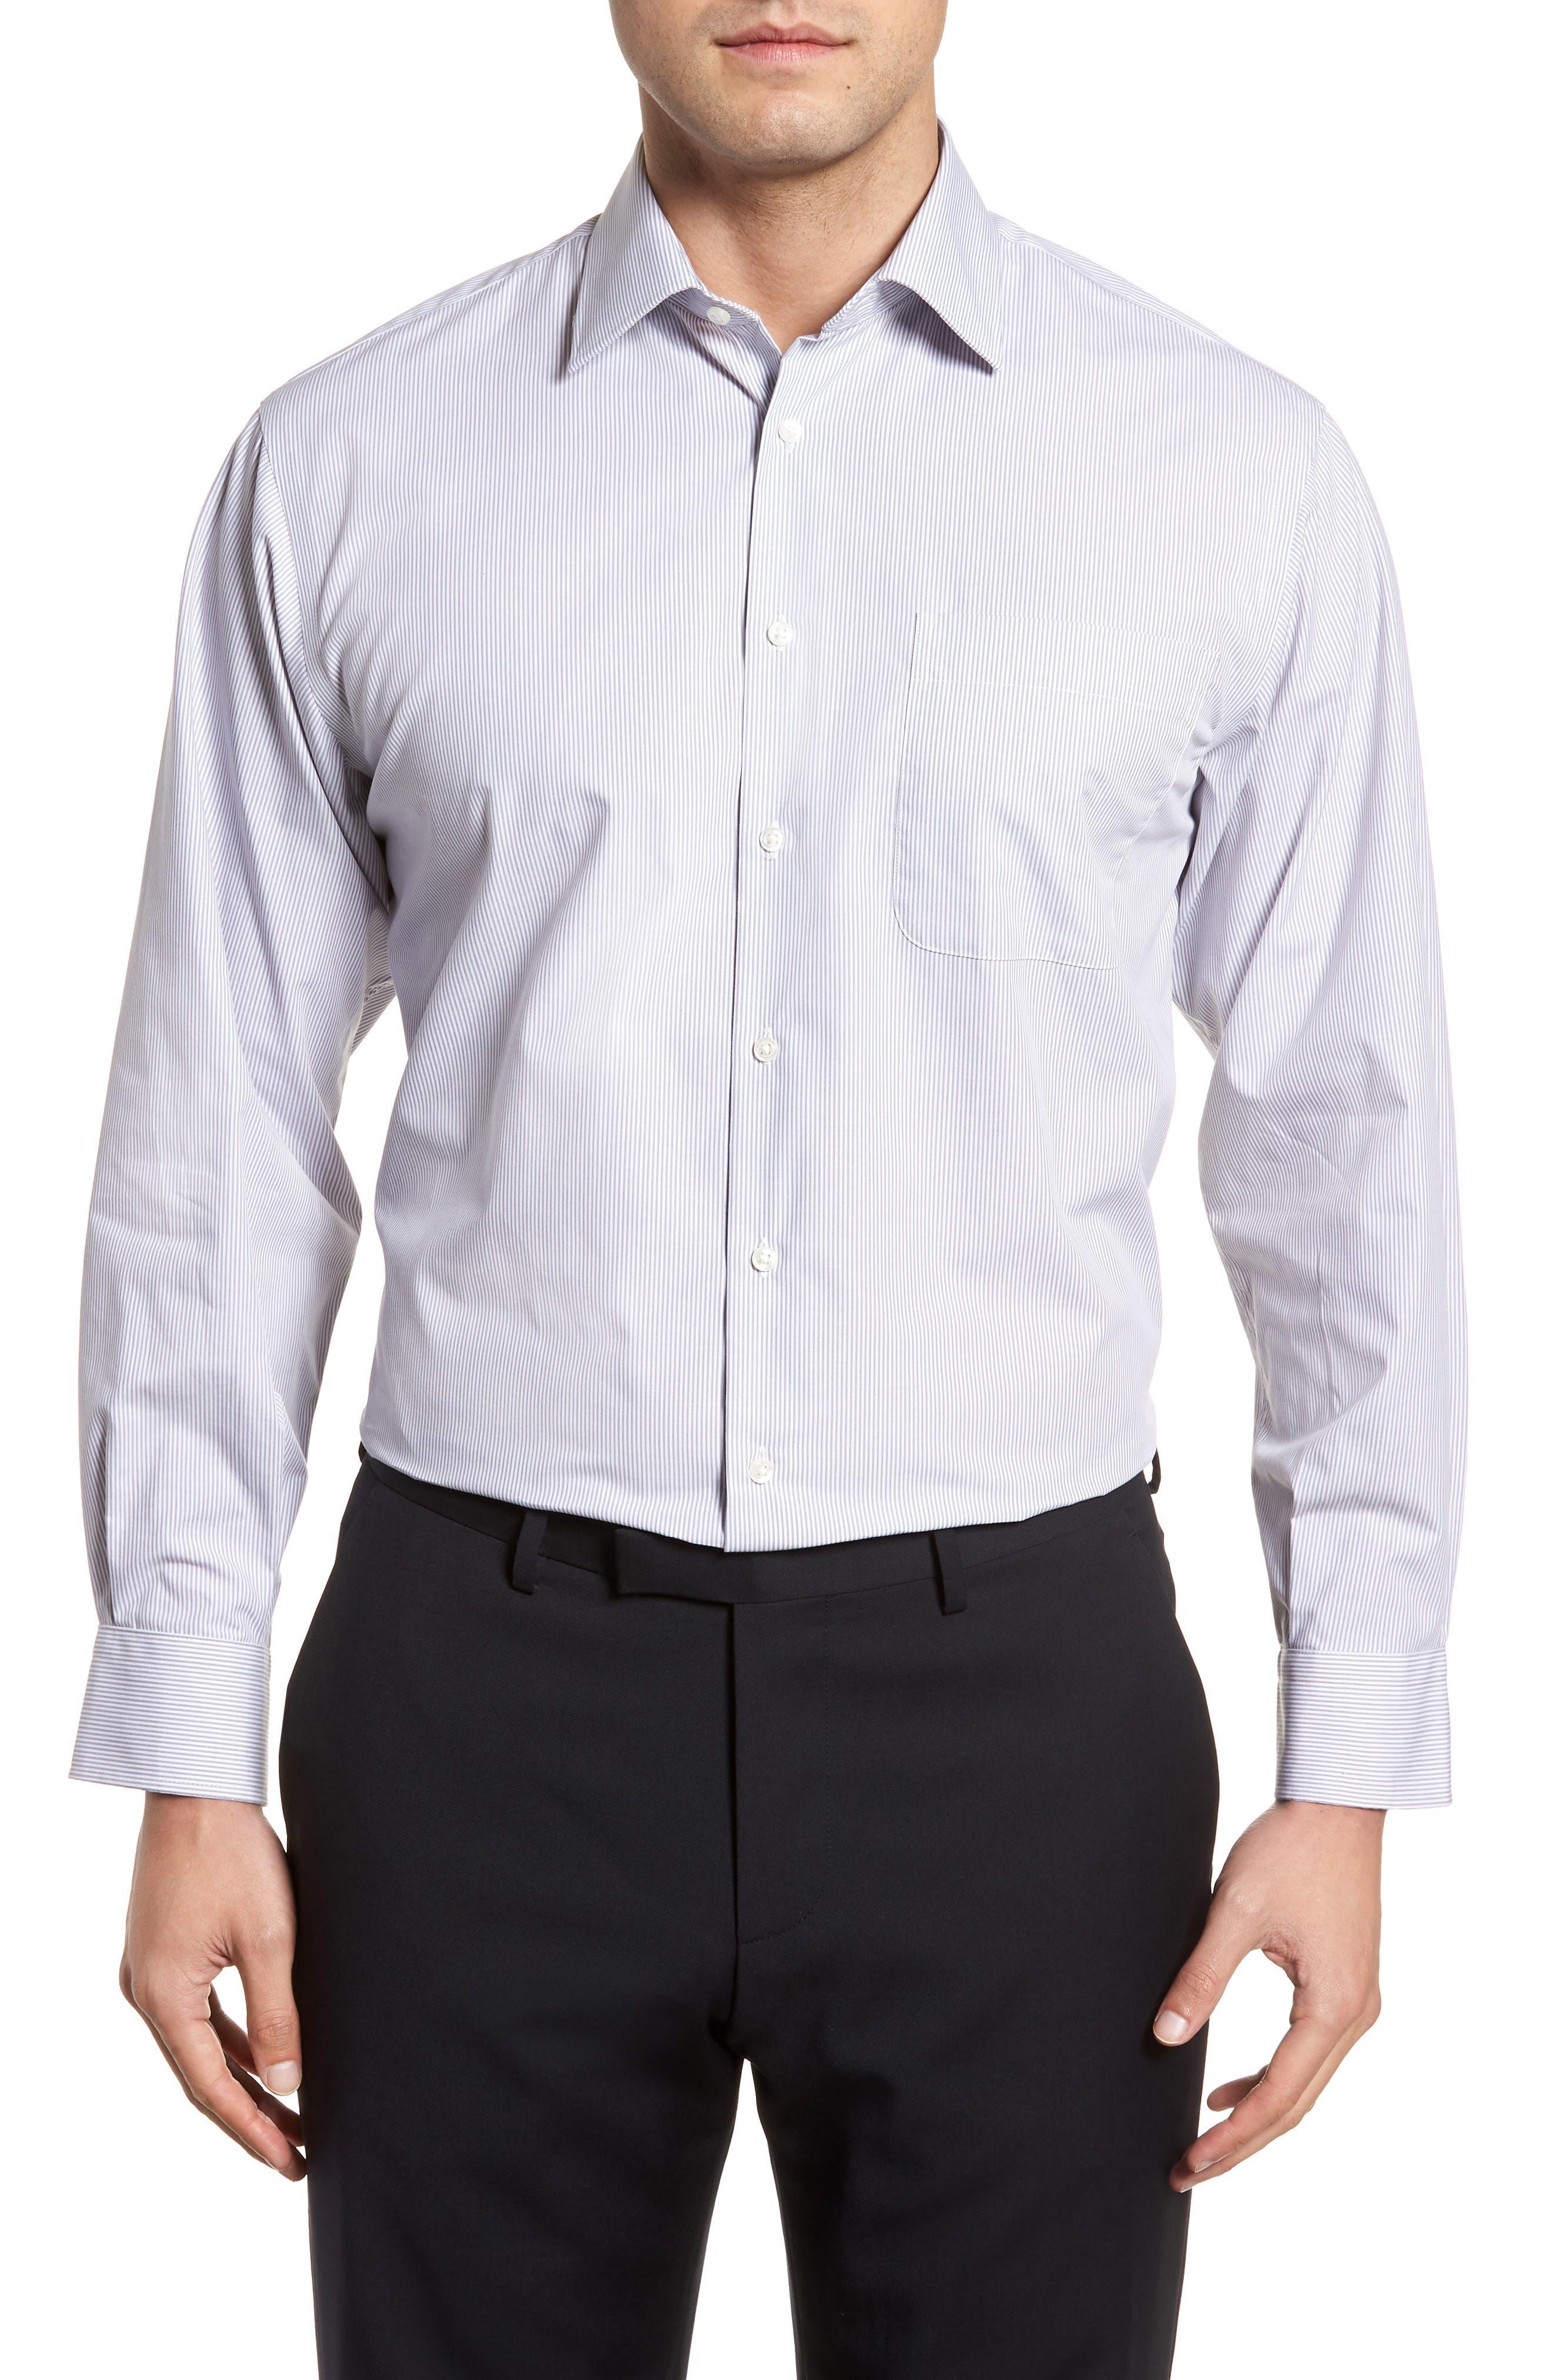 Main Image - Nordstrom Men's Shop Classic Fit Non-Iron Stripe Dress Shirt